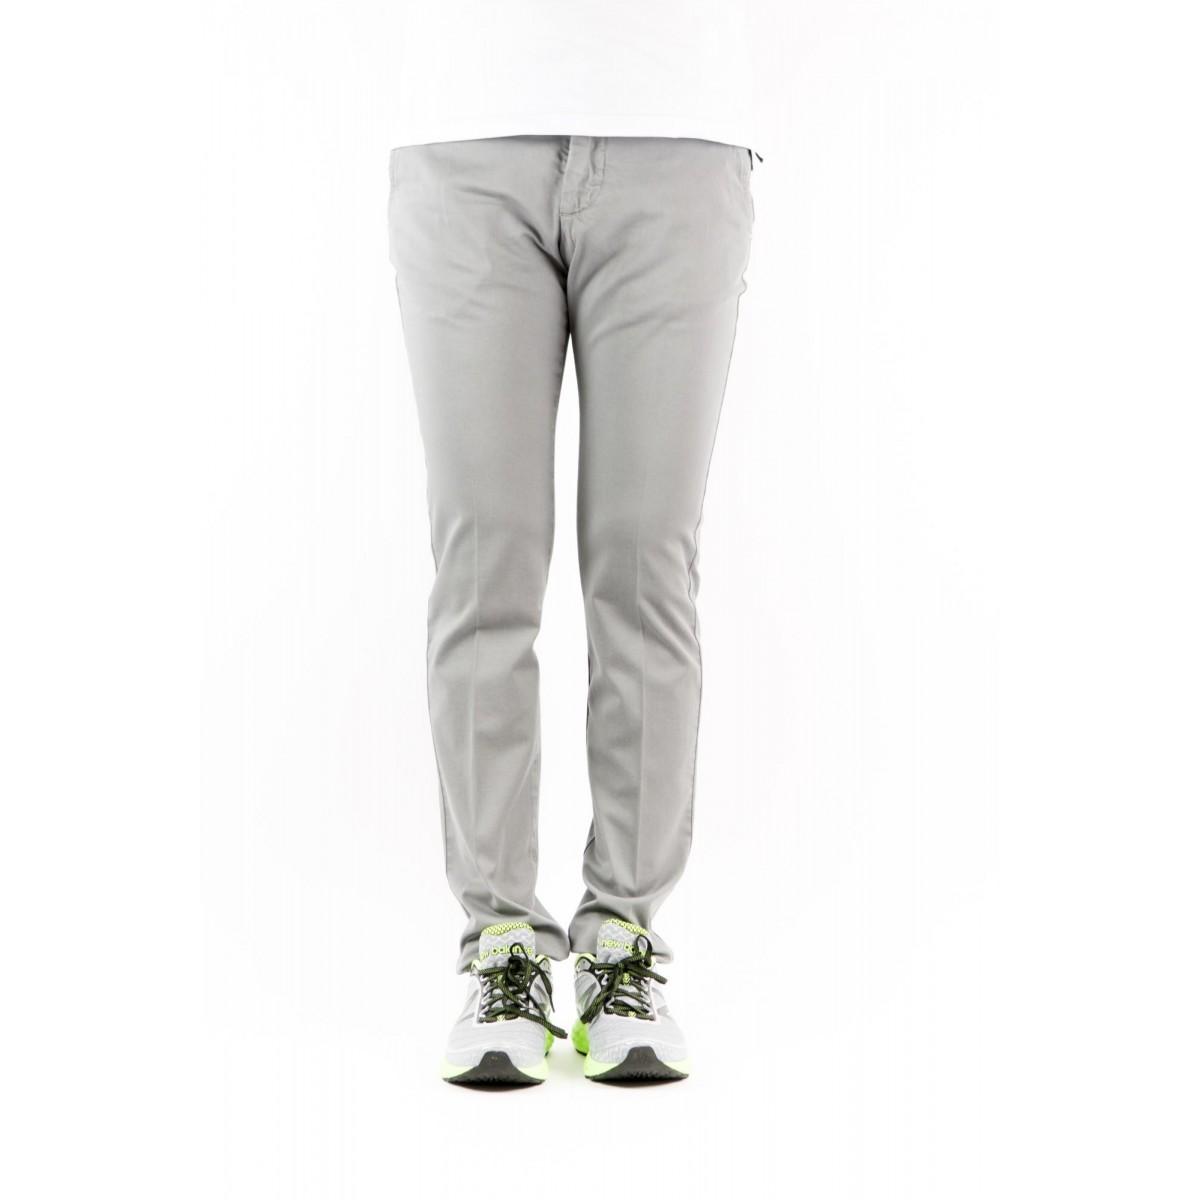 Pantalone uomo Entre amis - 8201 292l17 gabardina strech 0303 - grigio